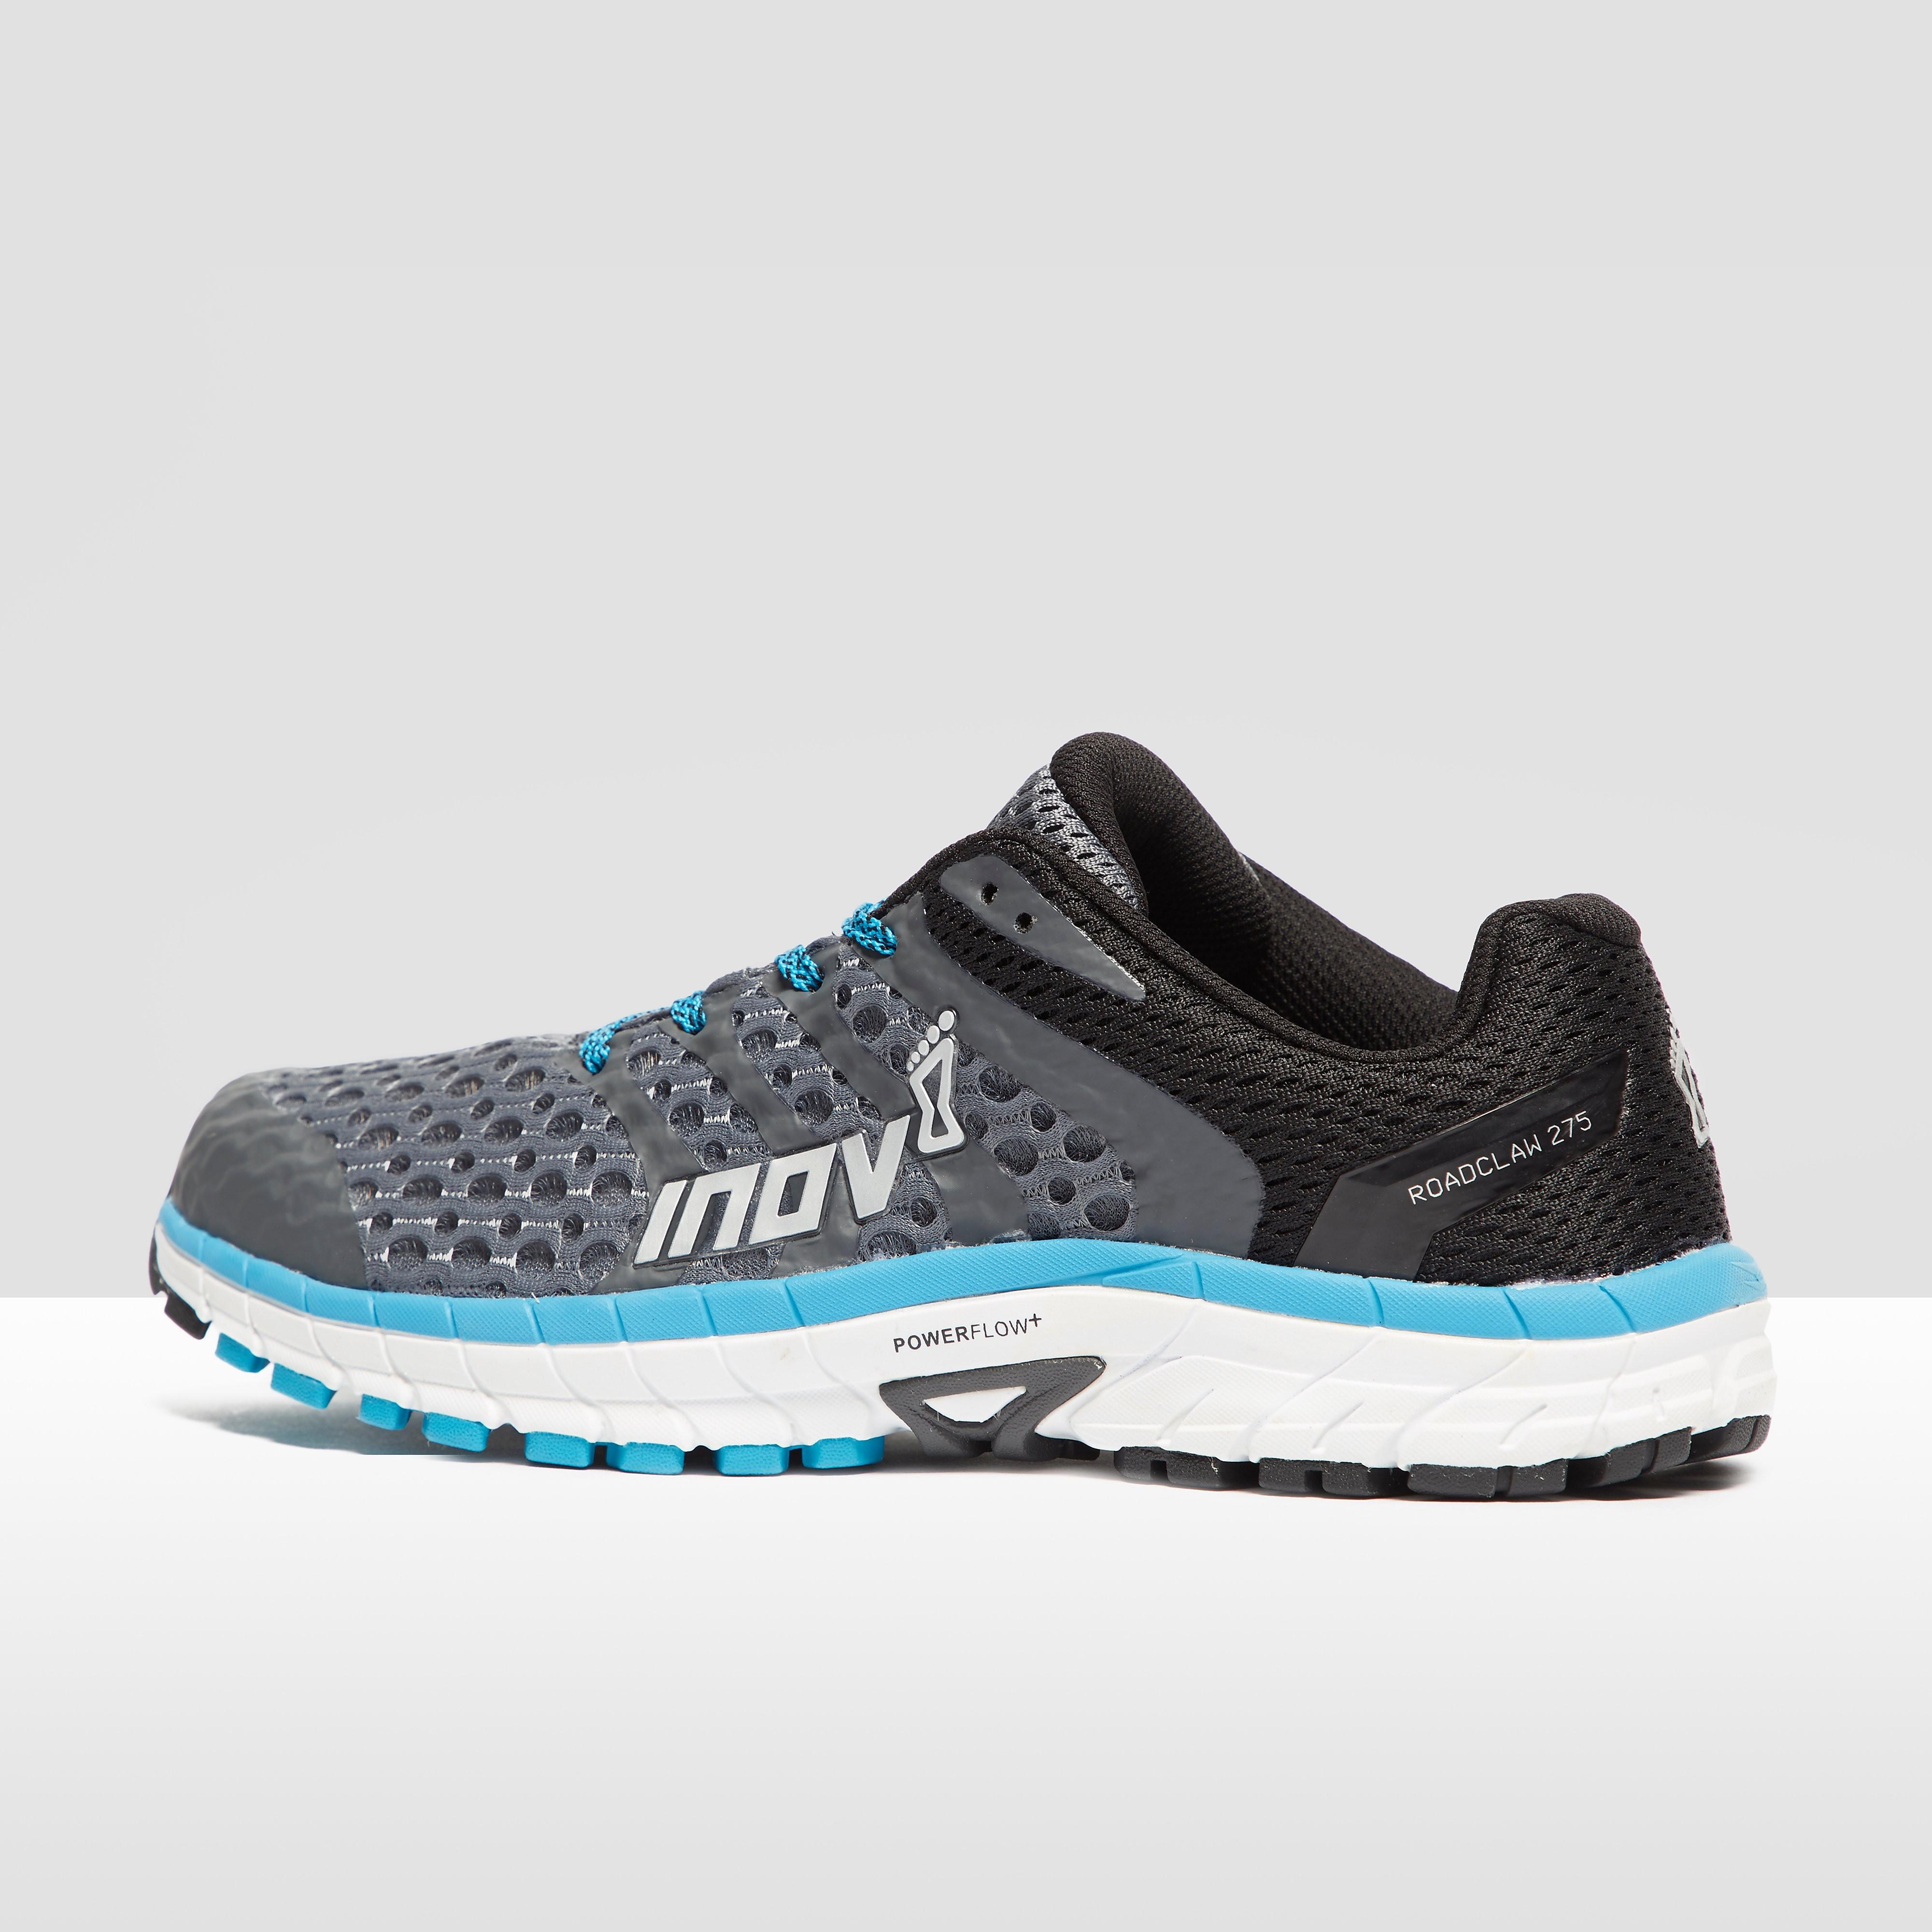 Inov-8 ROADCLAW 275 V2 Men's Trail Running Shoes